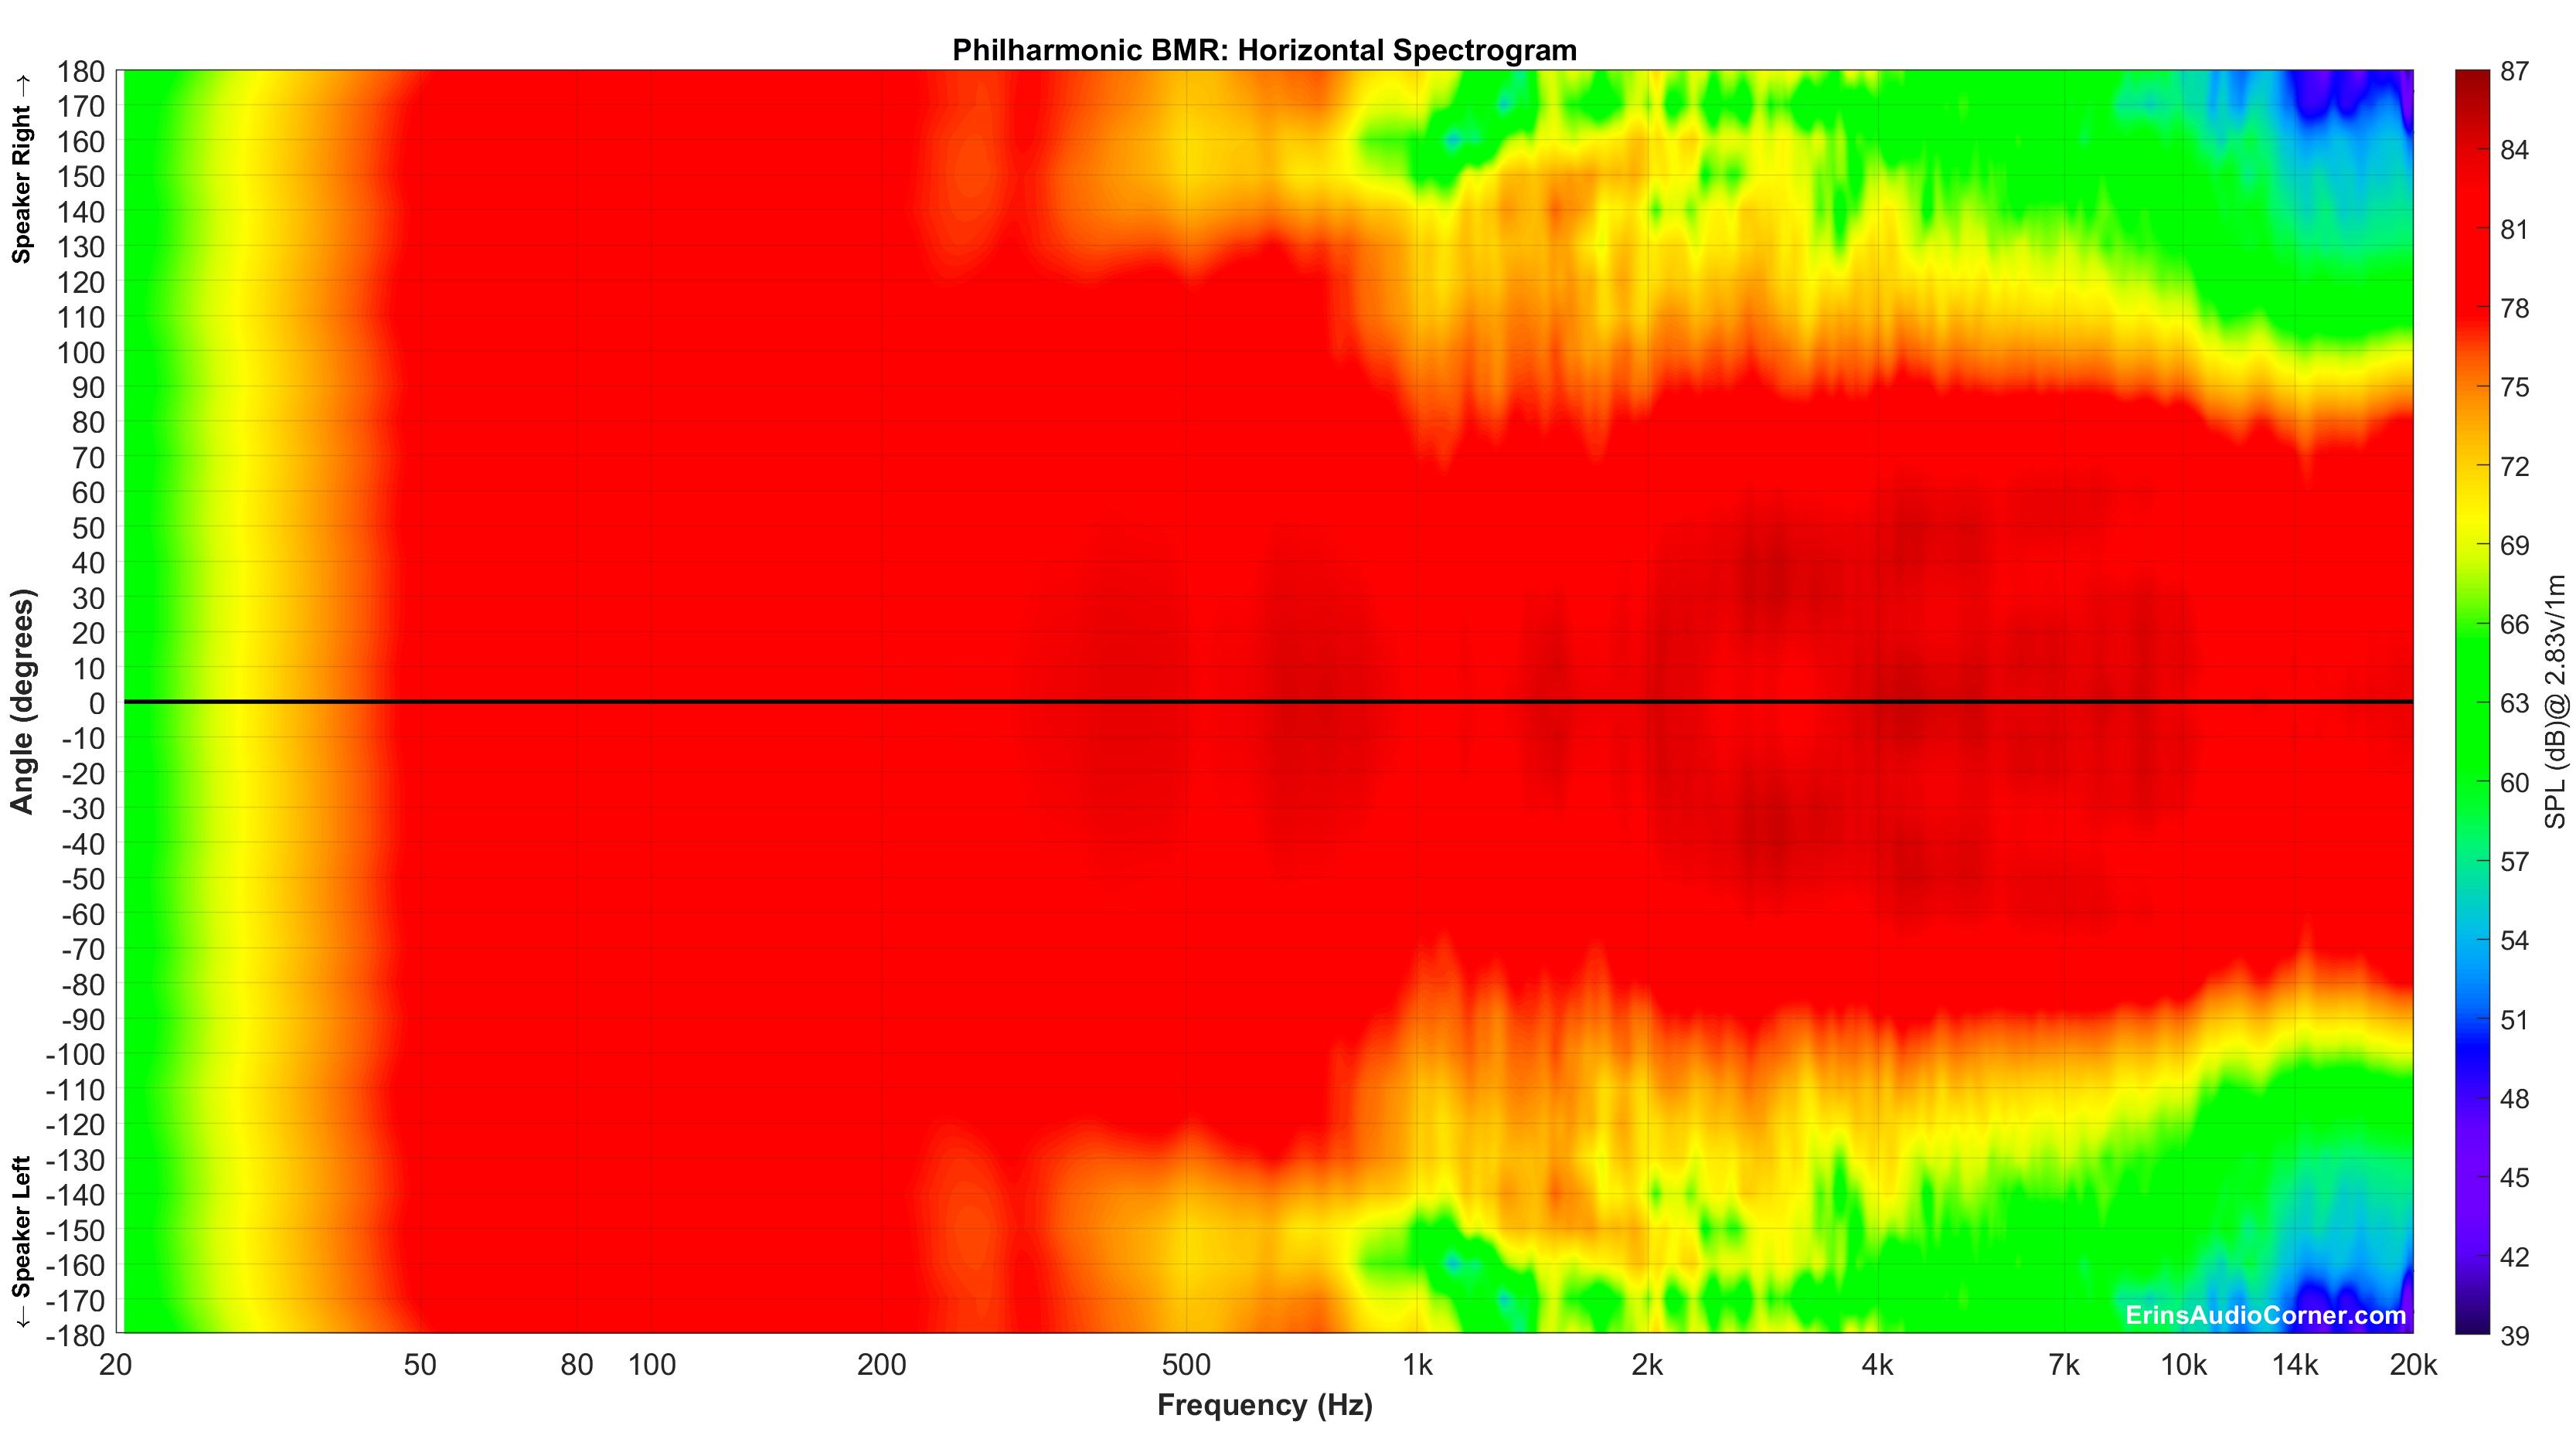 Philharmonic%20BMR_Horizontal_Spectrogram_Full.png